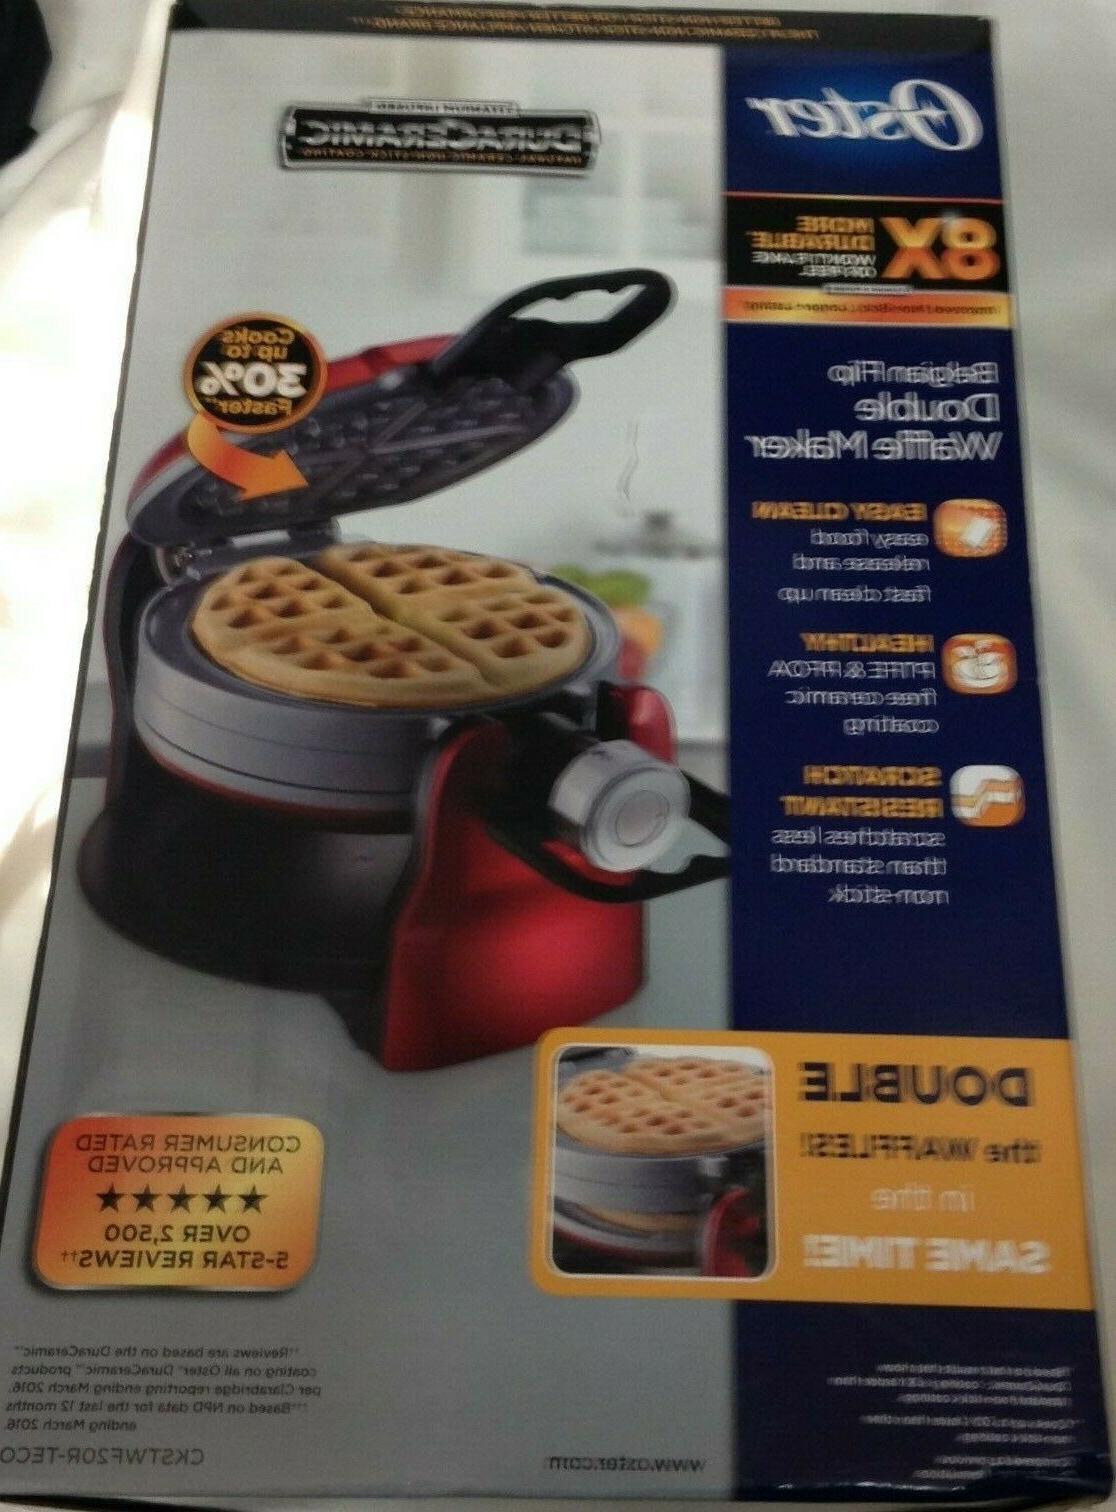 duraceramic double flip waffle maker